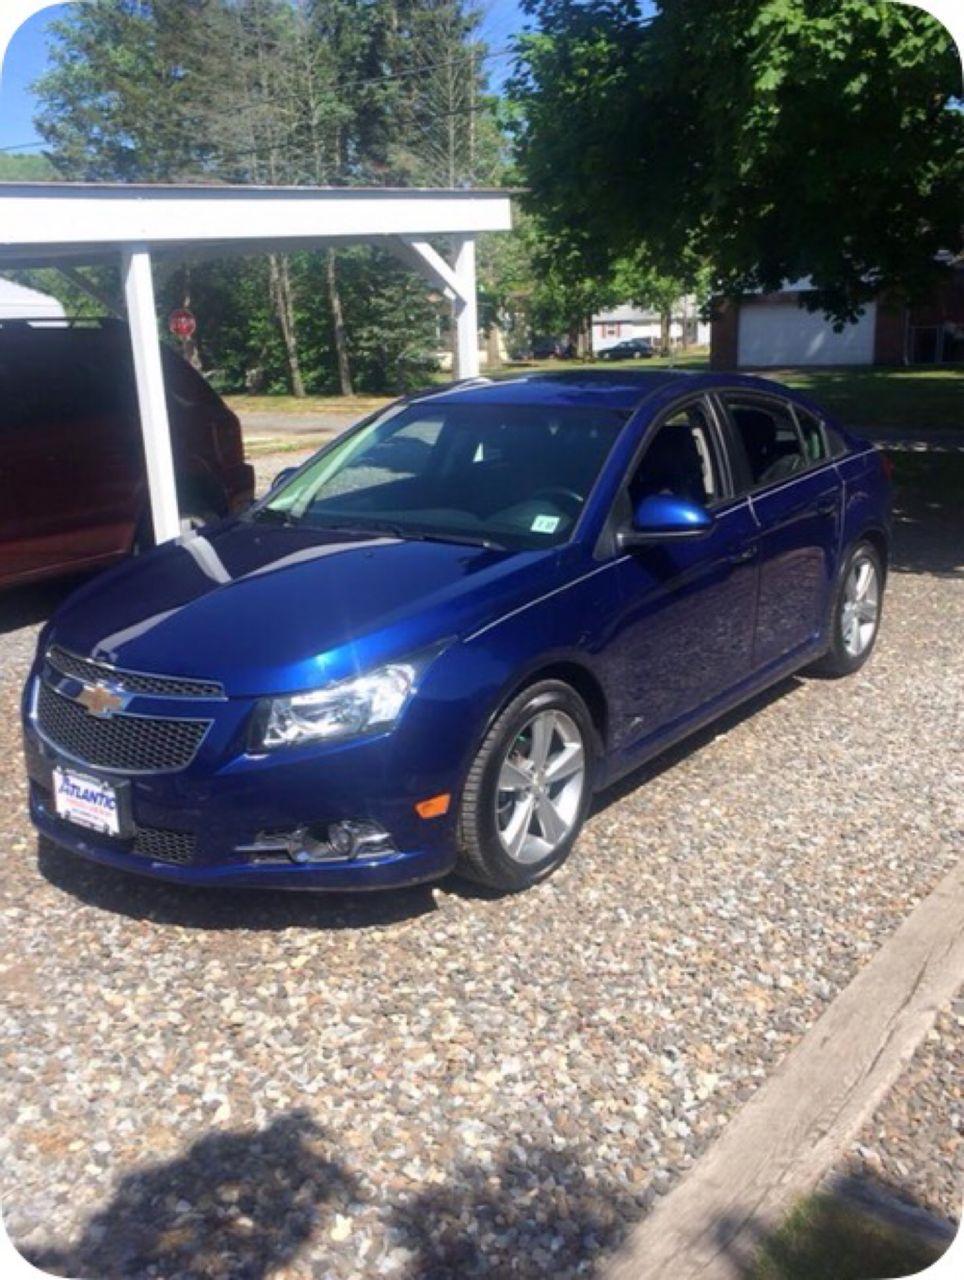 2012 Chevrolet Cruze LT | Tuckerton, NJ, Blue Granite Metallic (Blue), Front Wheel